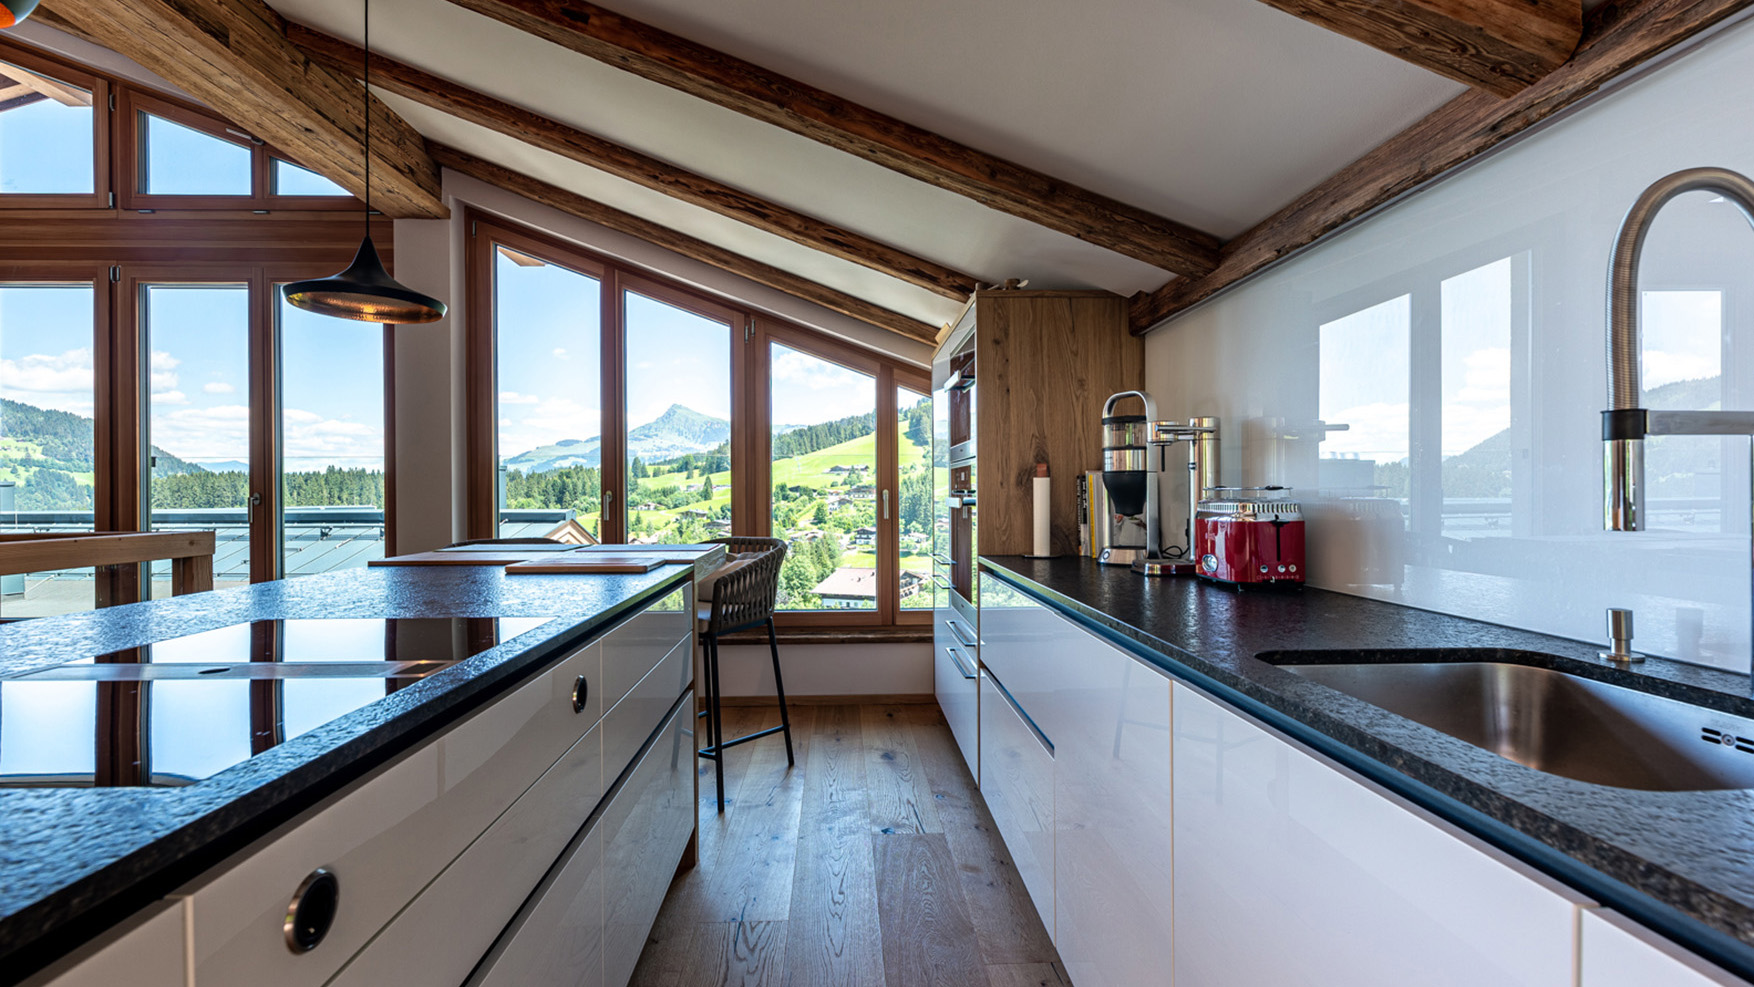 The Kirchberg Penthouse Apartments, Austria